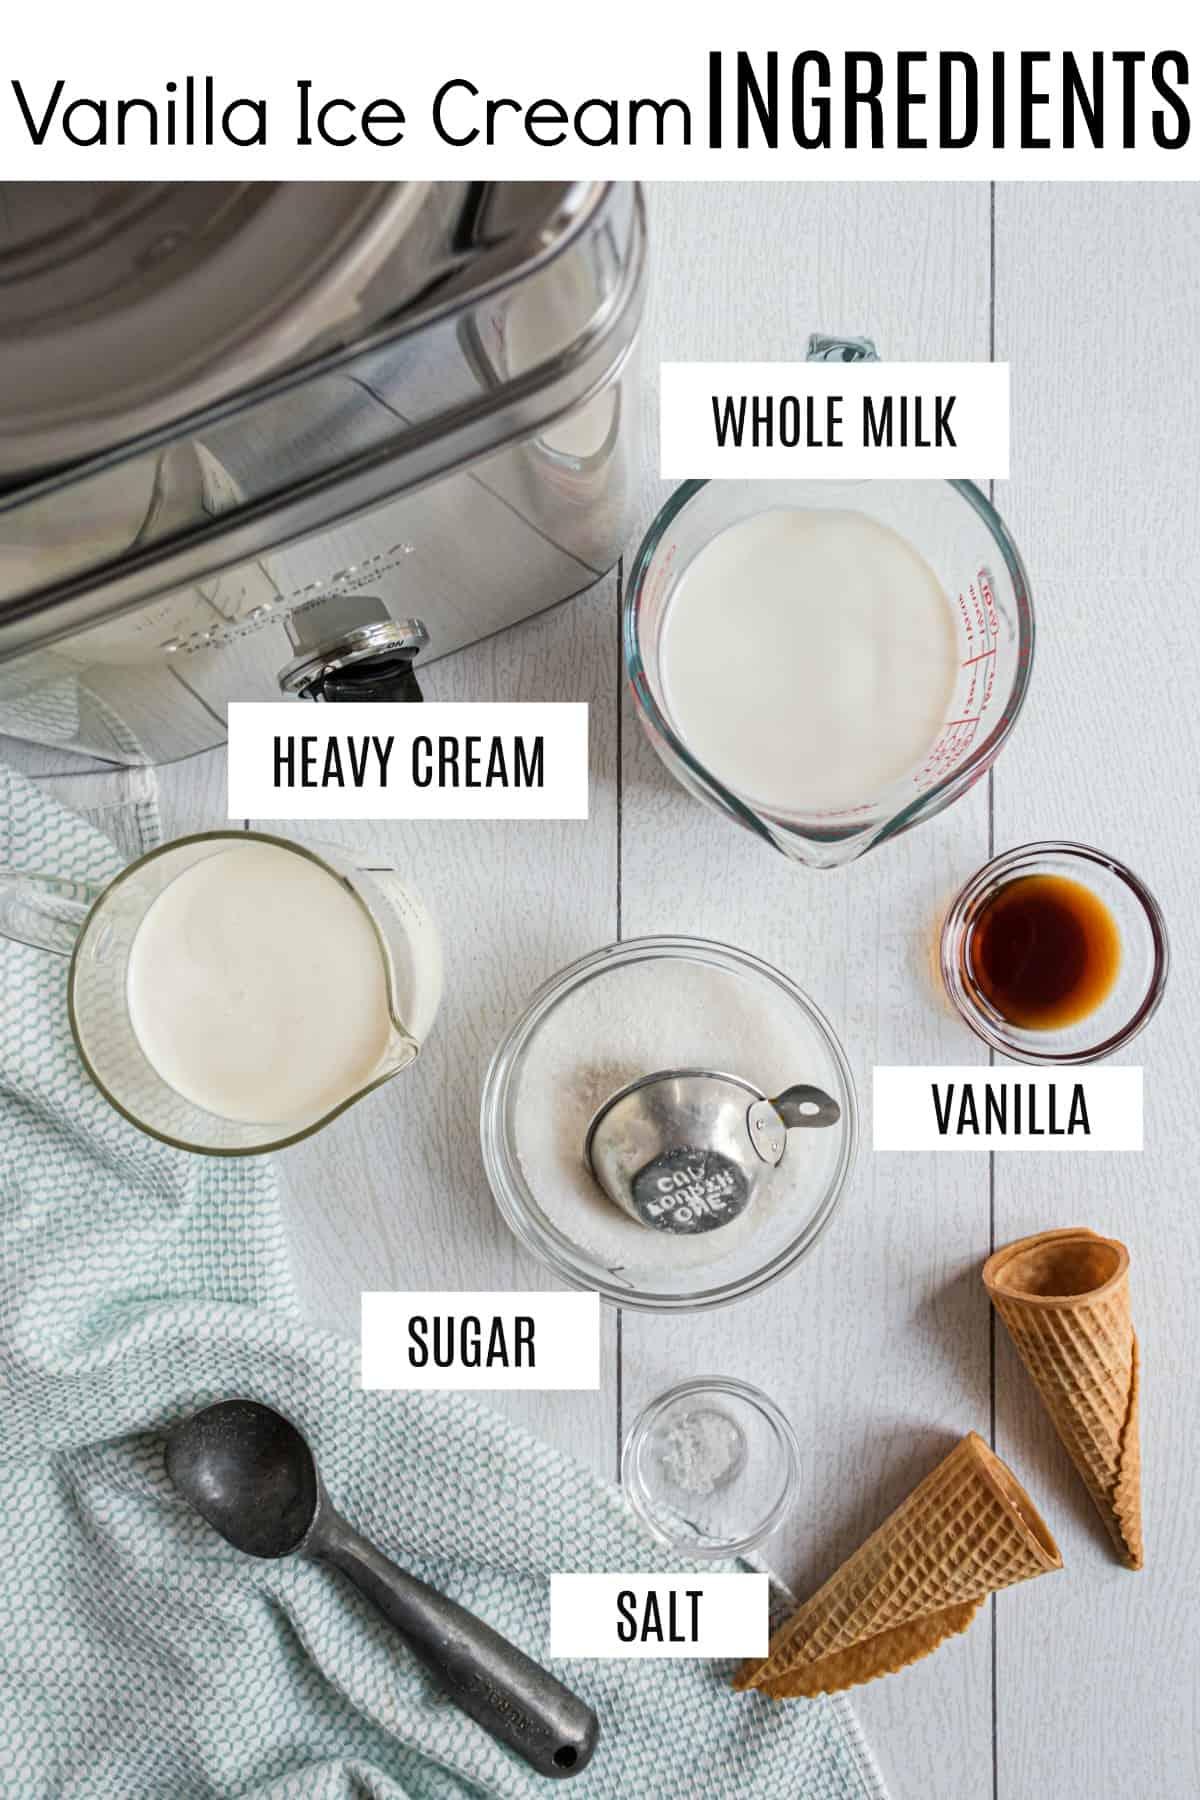 Ingredients needed to make homemade vanilla ice cream in an ice cream maker.